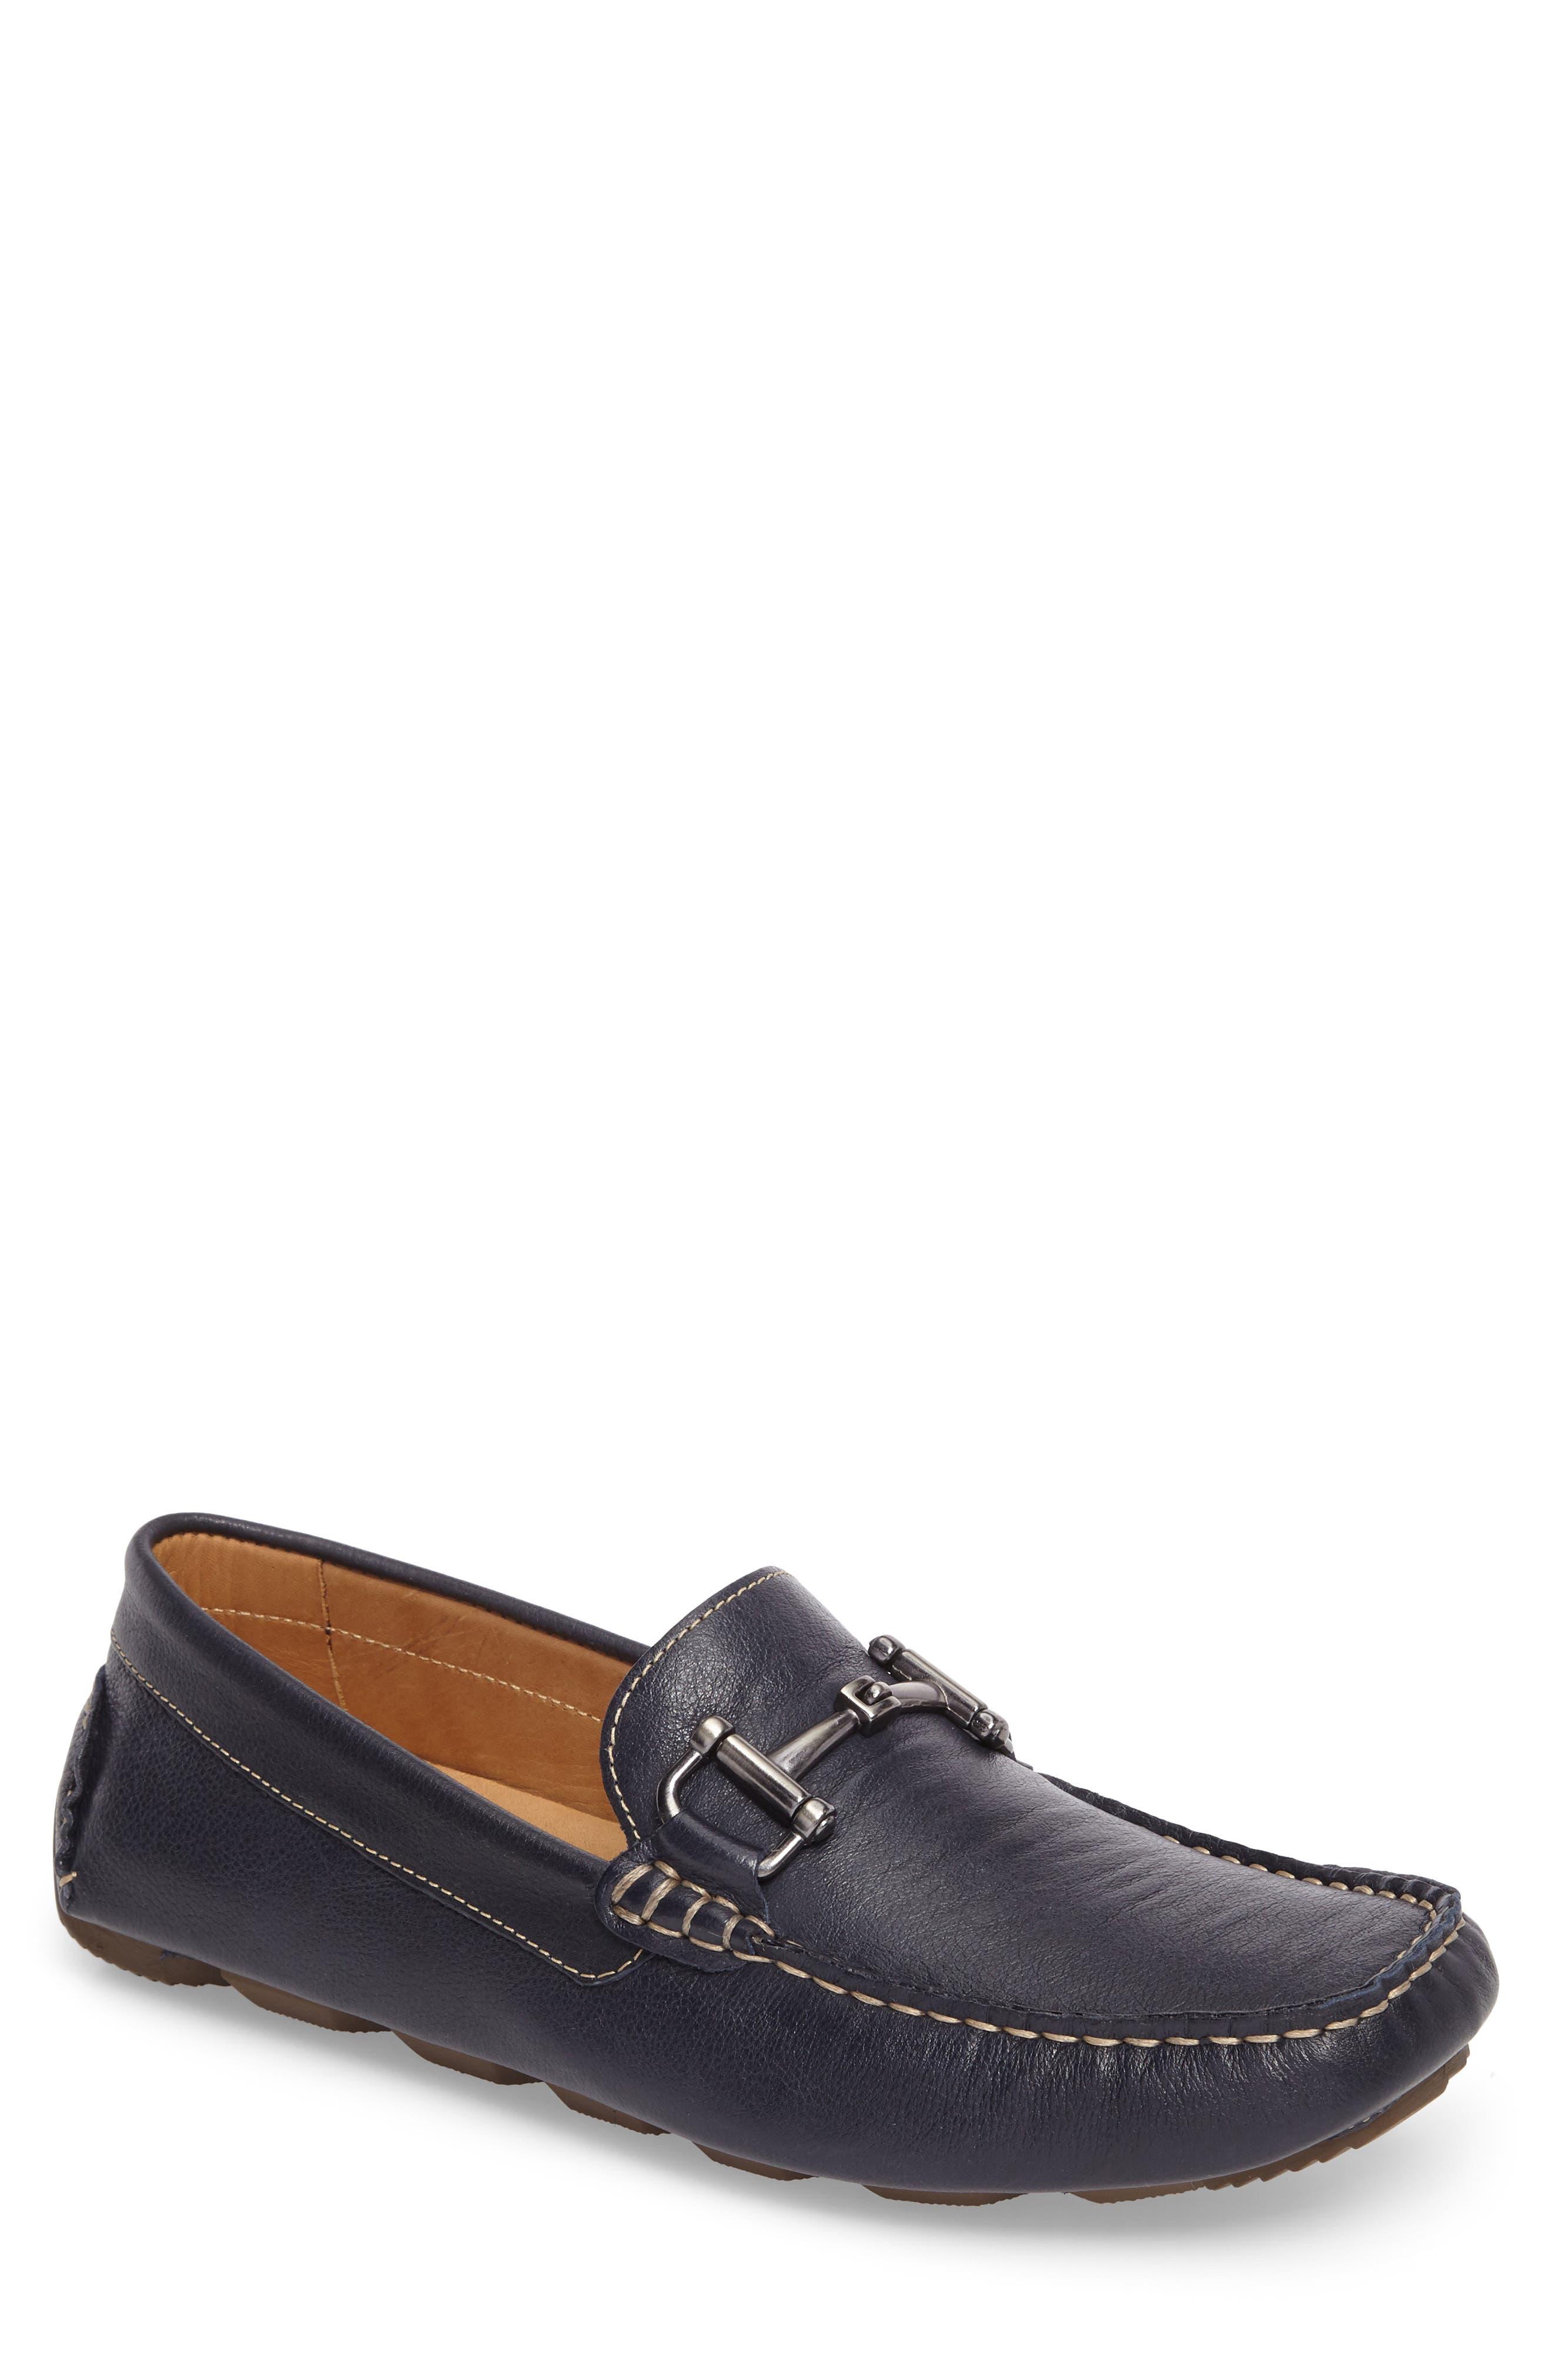 Topanga Driving Shoe,                         Main,                         color, Navy Leather